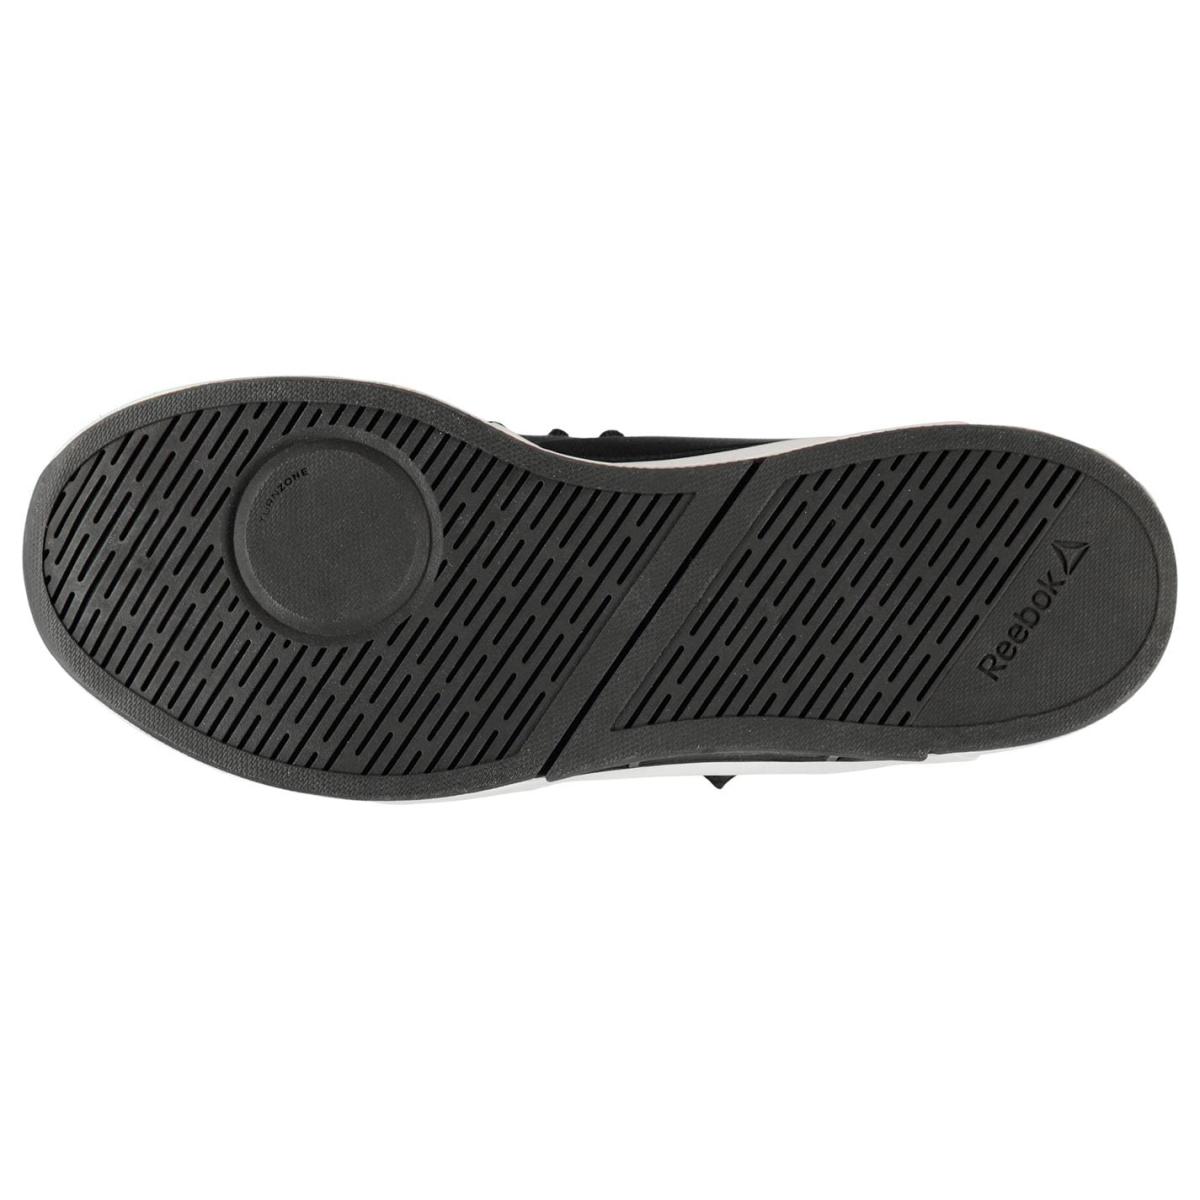 Reebok-Guresu-2-Turnschuhe-Laufschuhe-Damen-Sportschuhe-Sneaker-0163 Indexbild 3